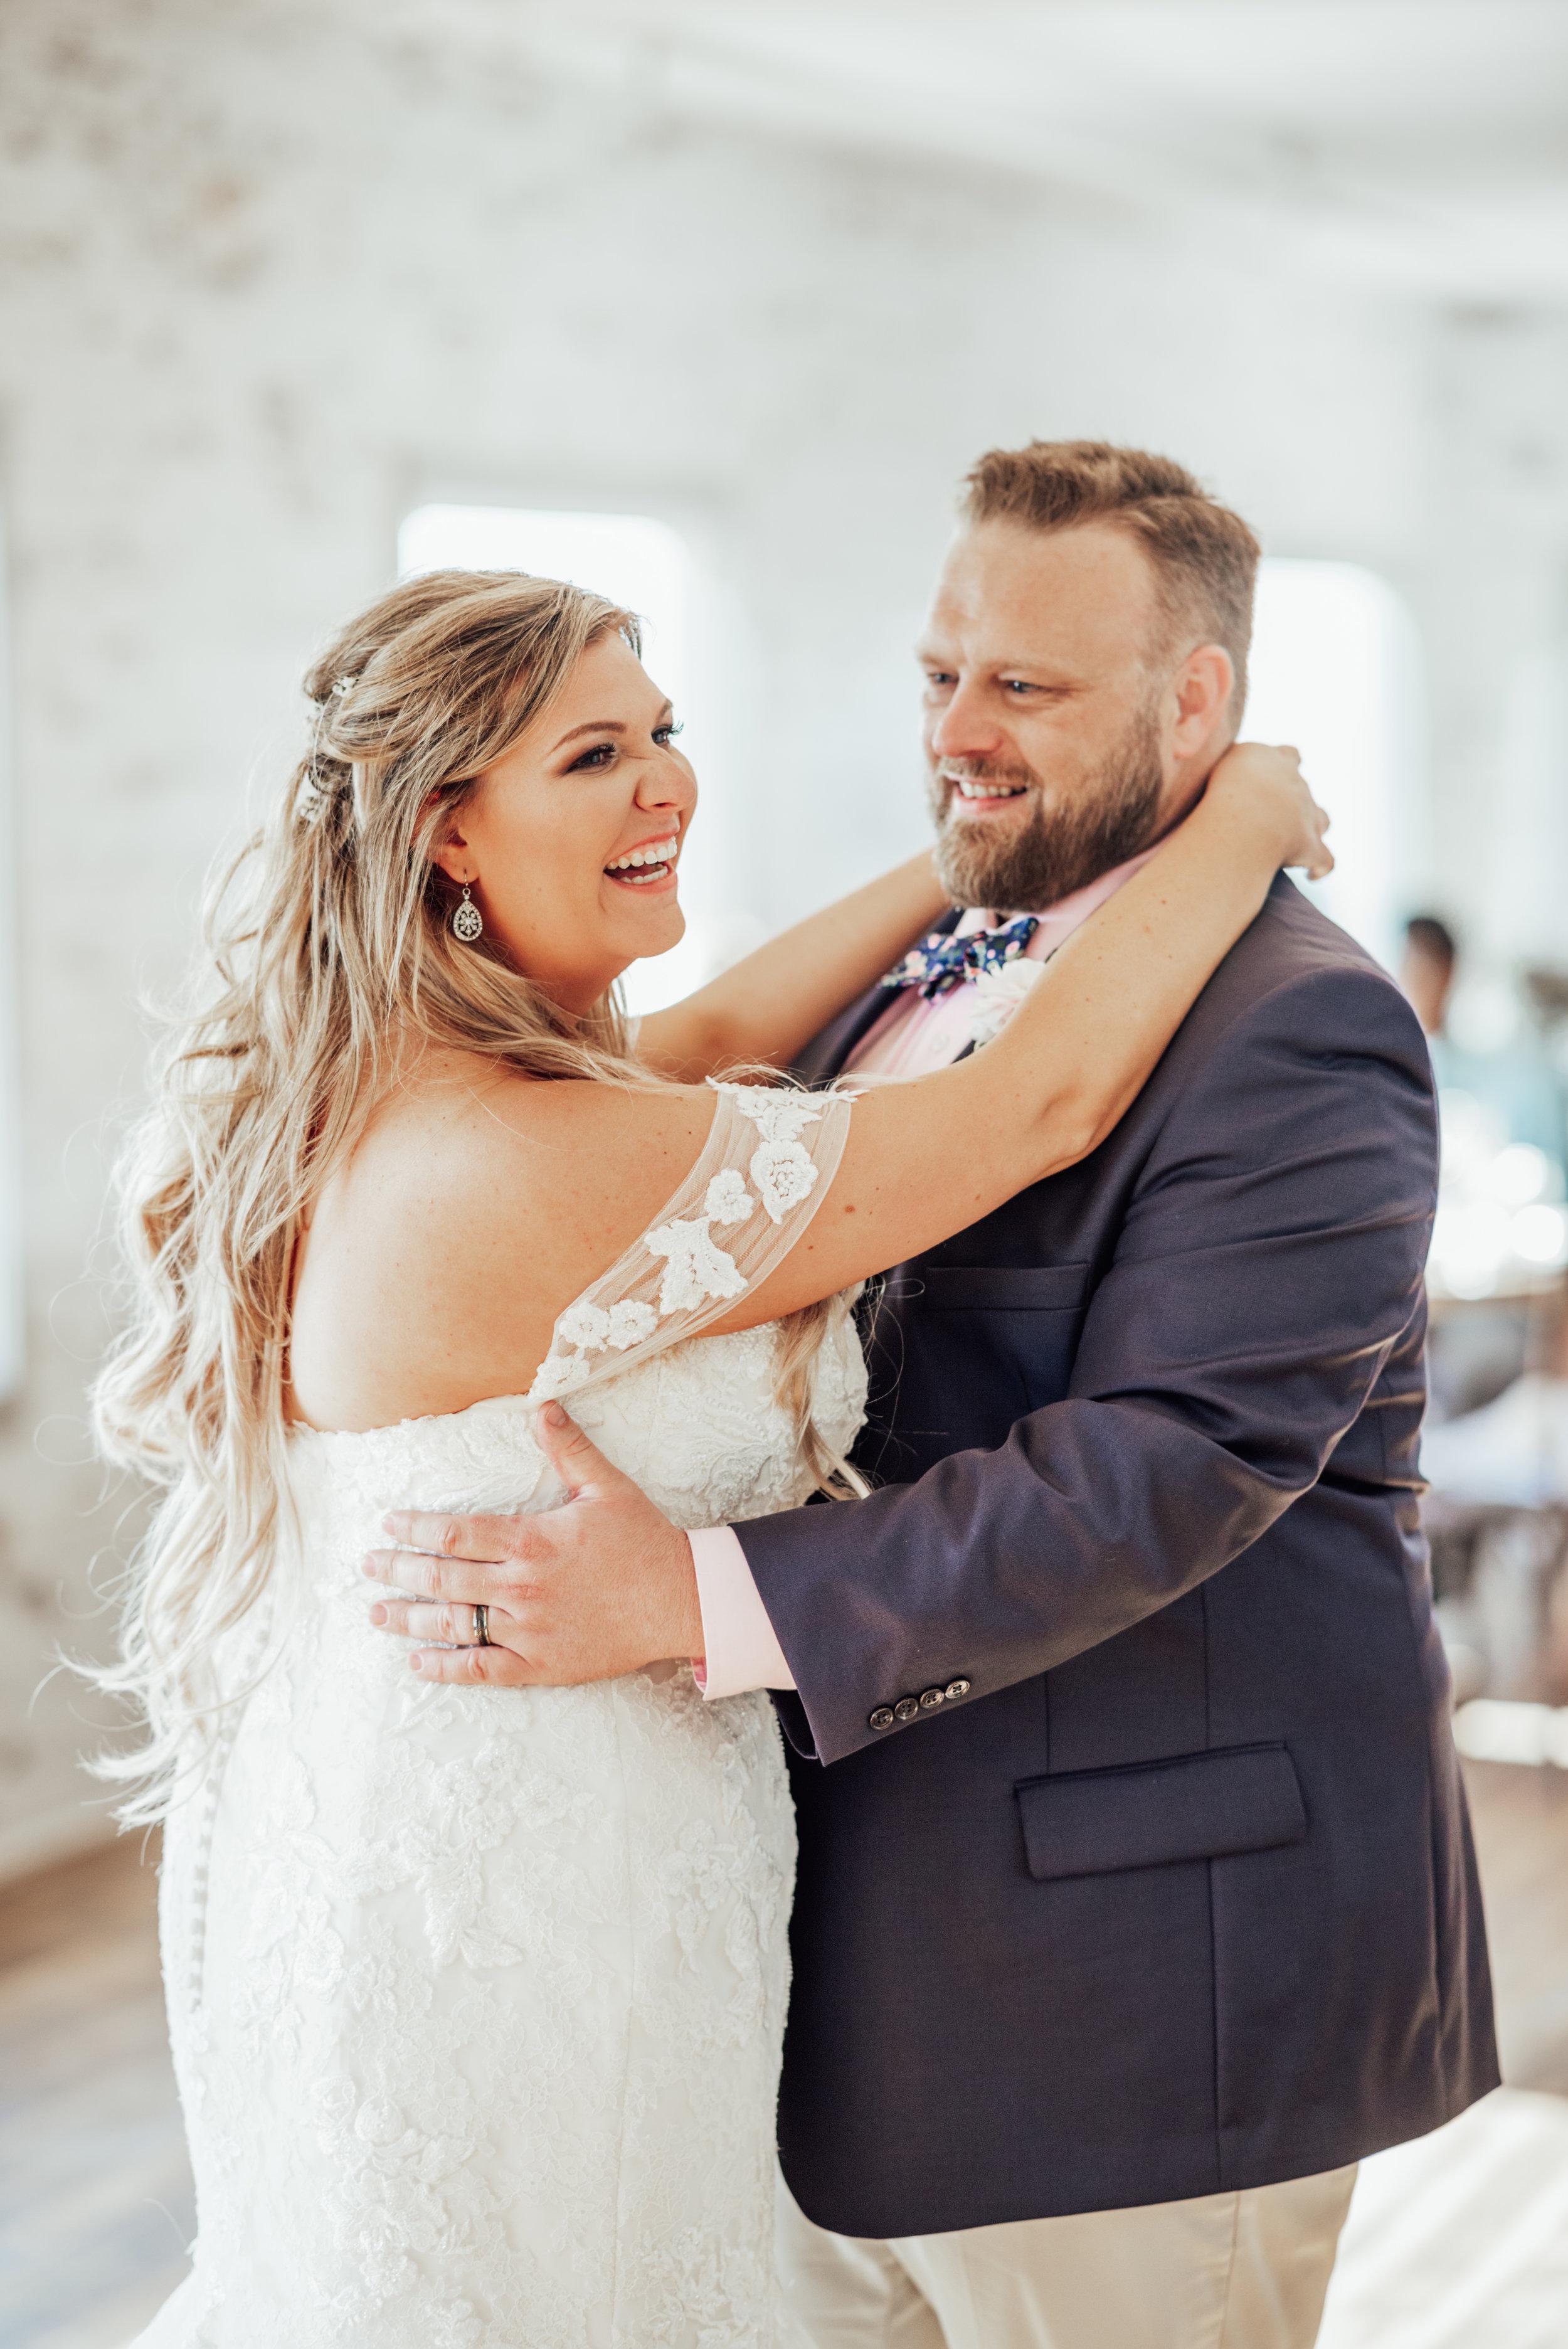 New Jersey Wedding Photographer, Felsberg Photography LBI wedding photography 91.jpg